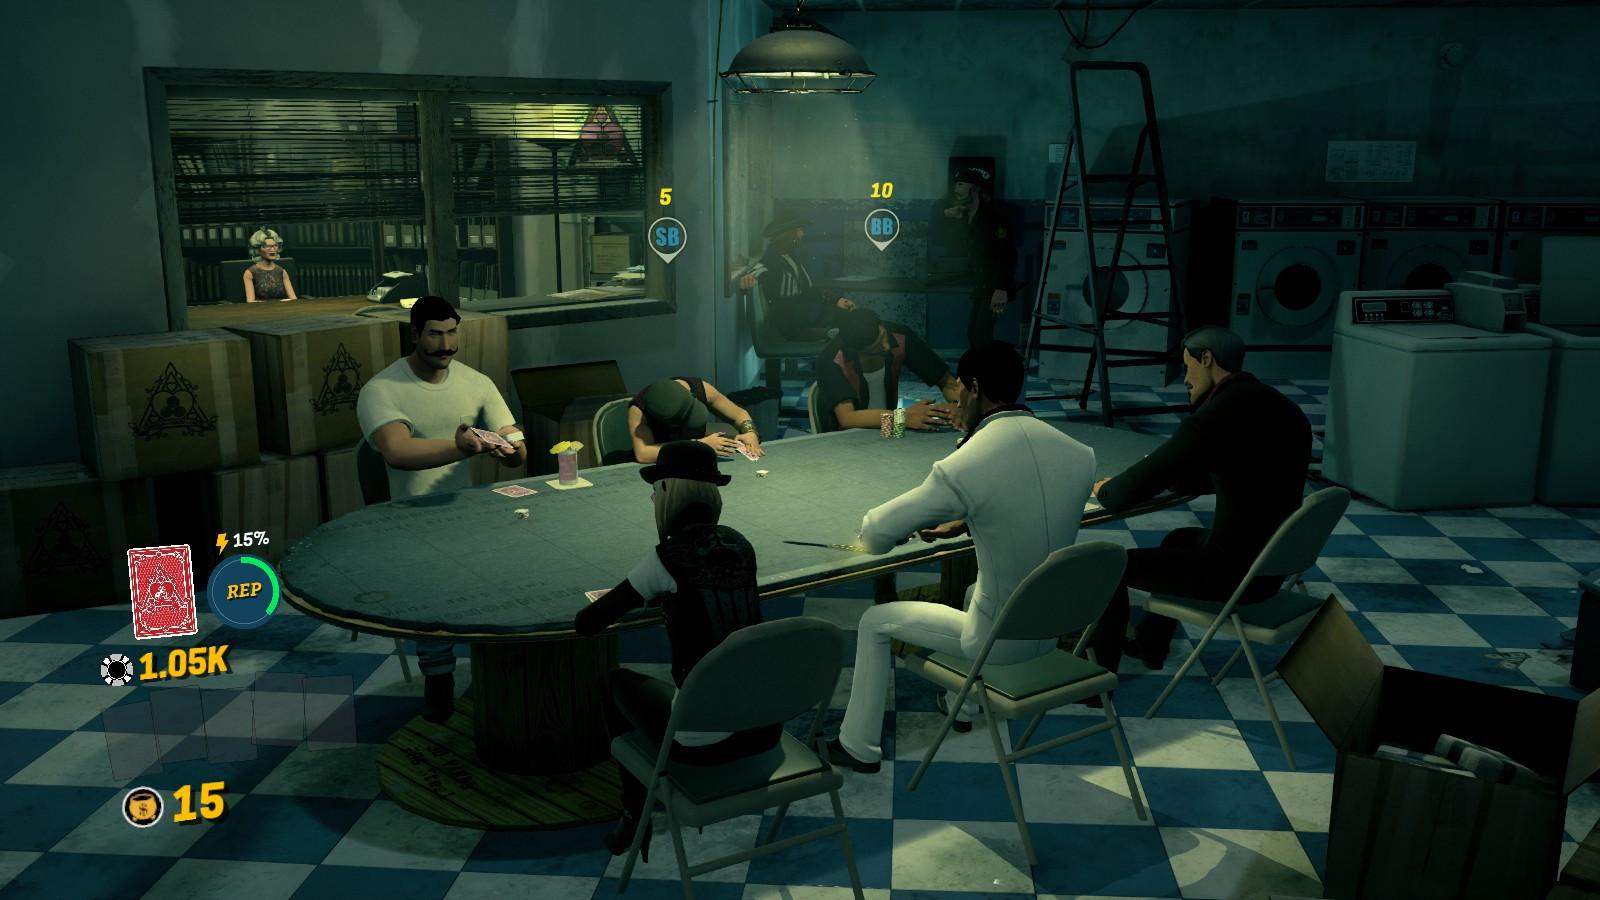 Prominence Poker - Dubiose Waschküche